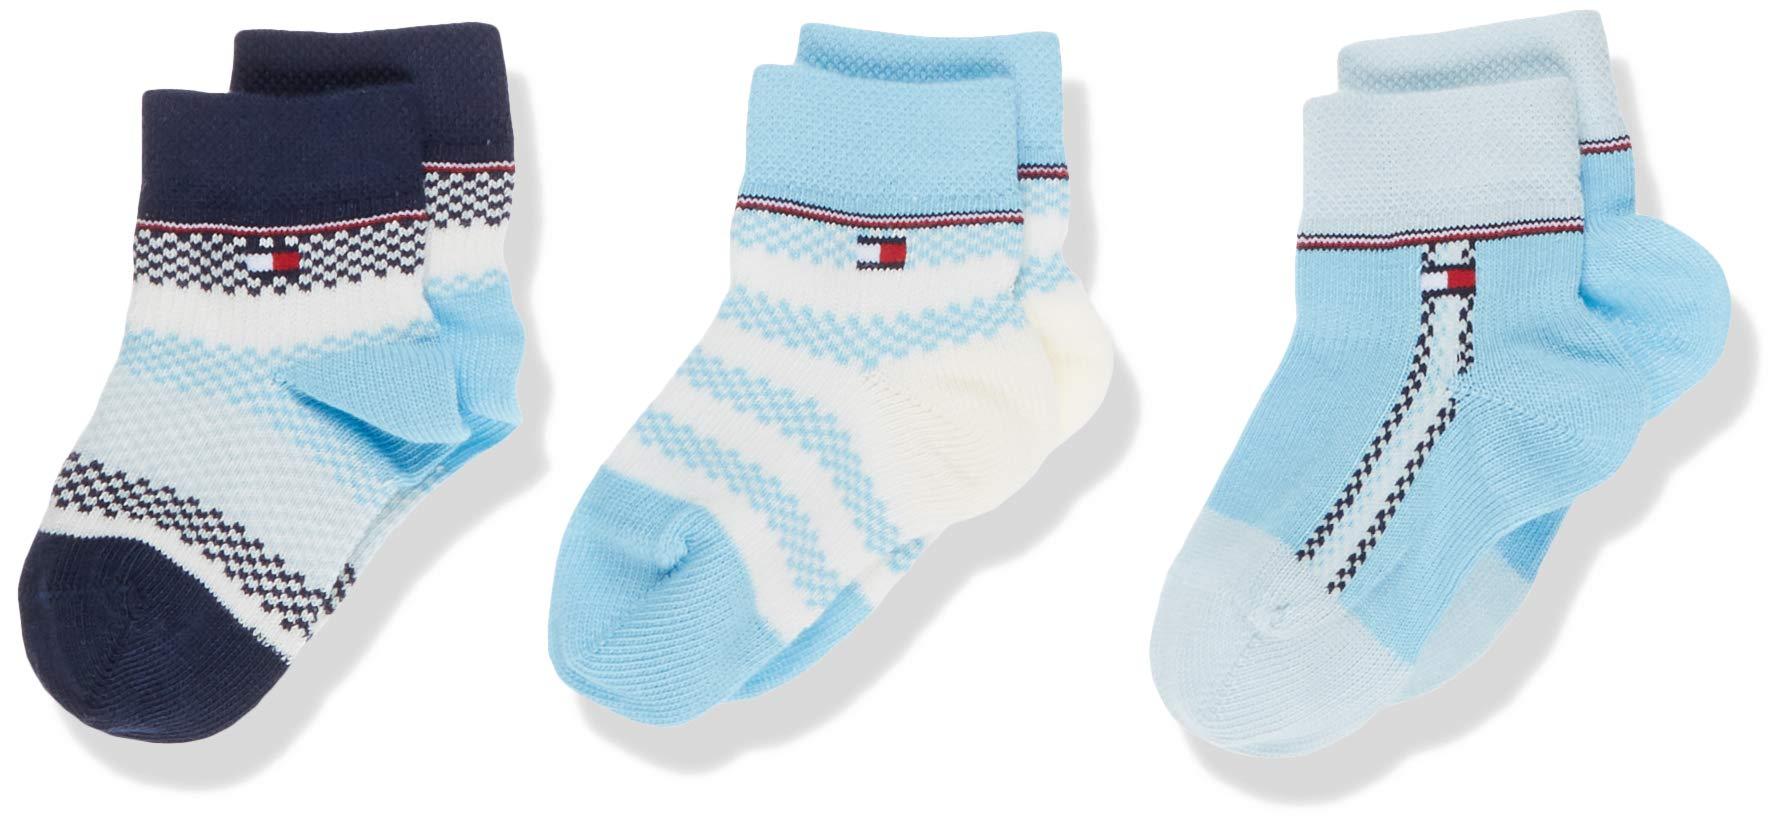 Tommy Hilfiger Calcetines (Pack de 3) para Bebés 1